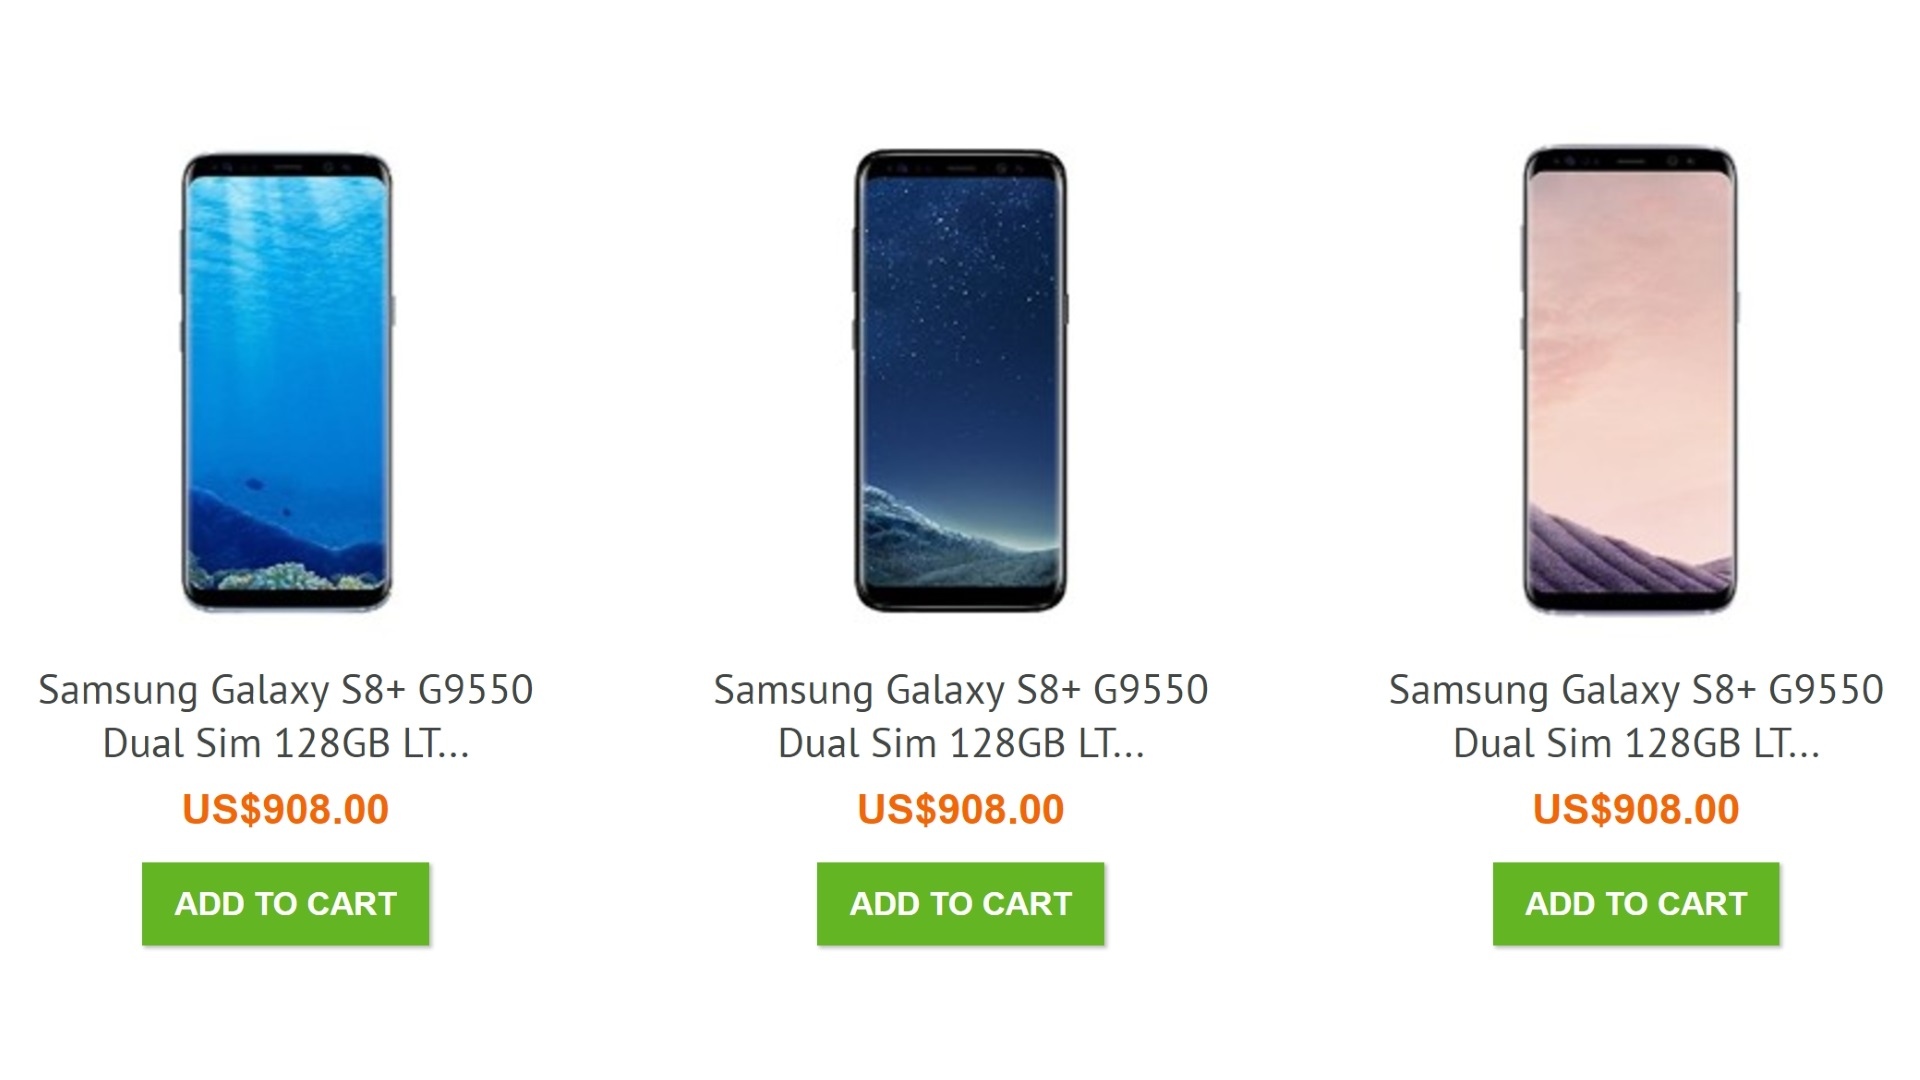 Uniqbeに6GB RAM搭載「Galaxy S8+」が入荷